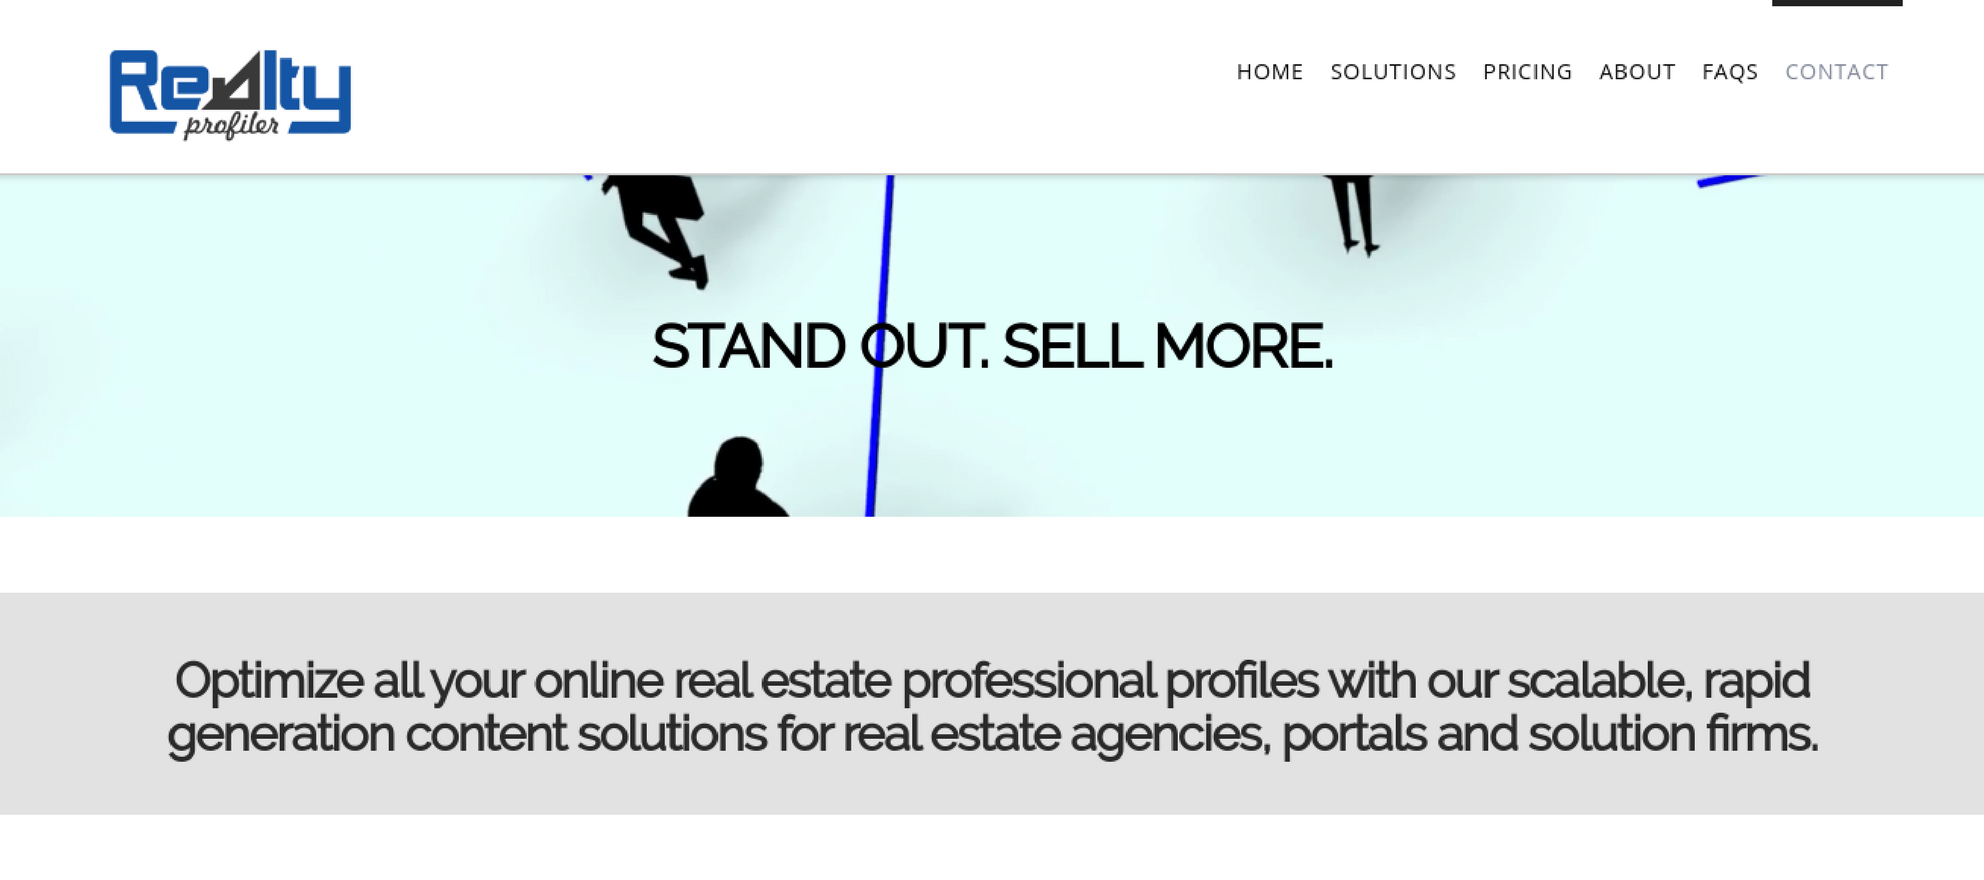 Realty Profiler